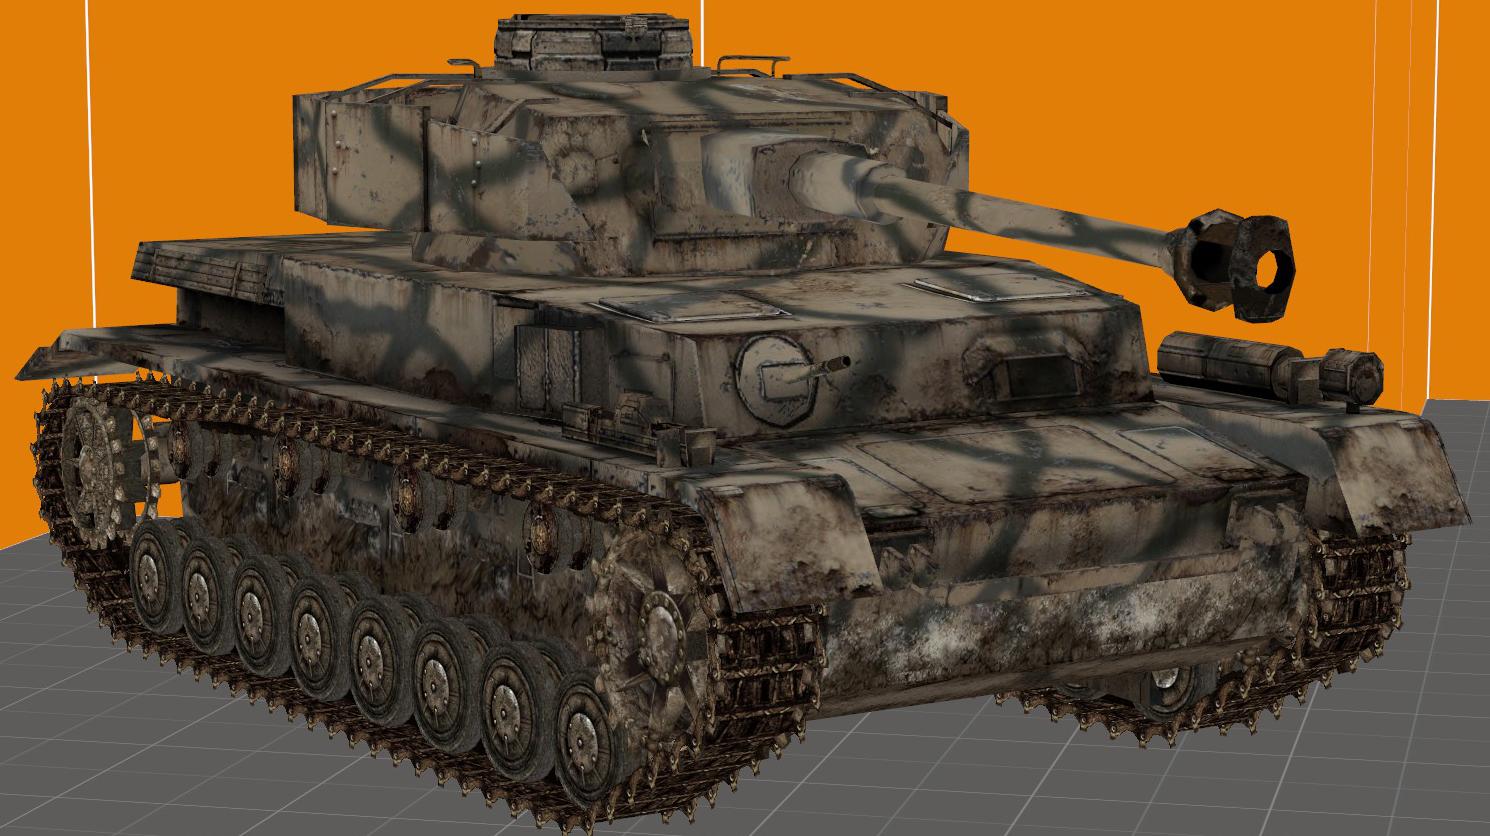 Panzer IV | Call of Duty Wiki | Fandom